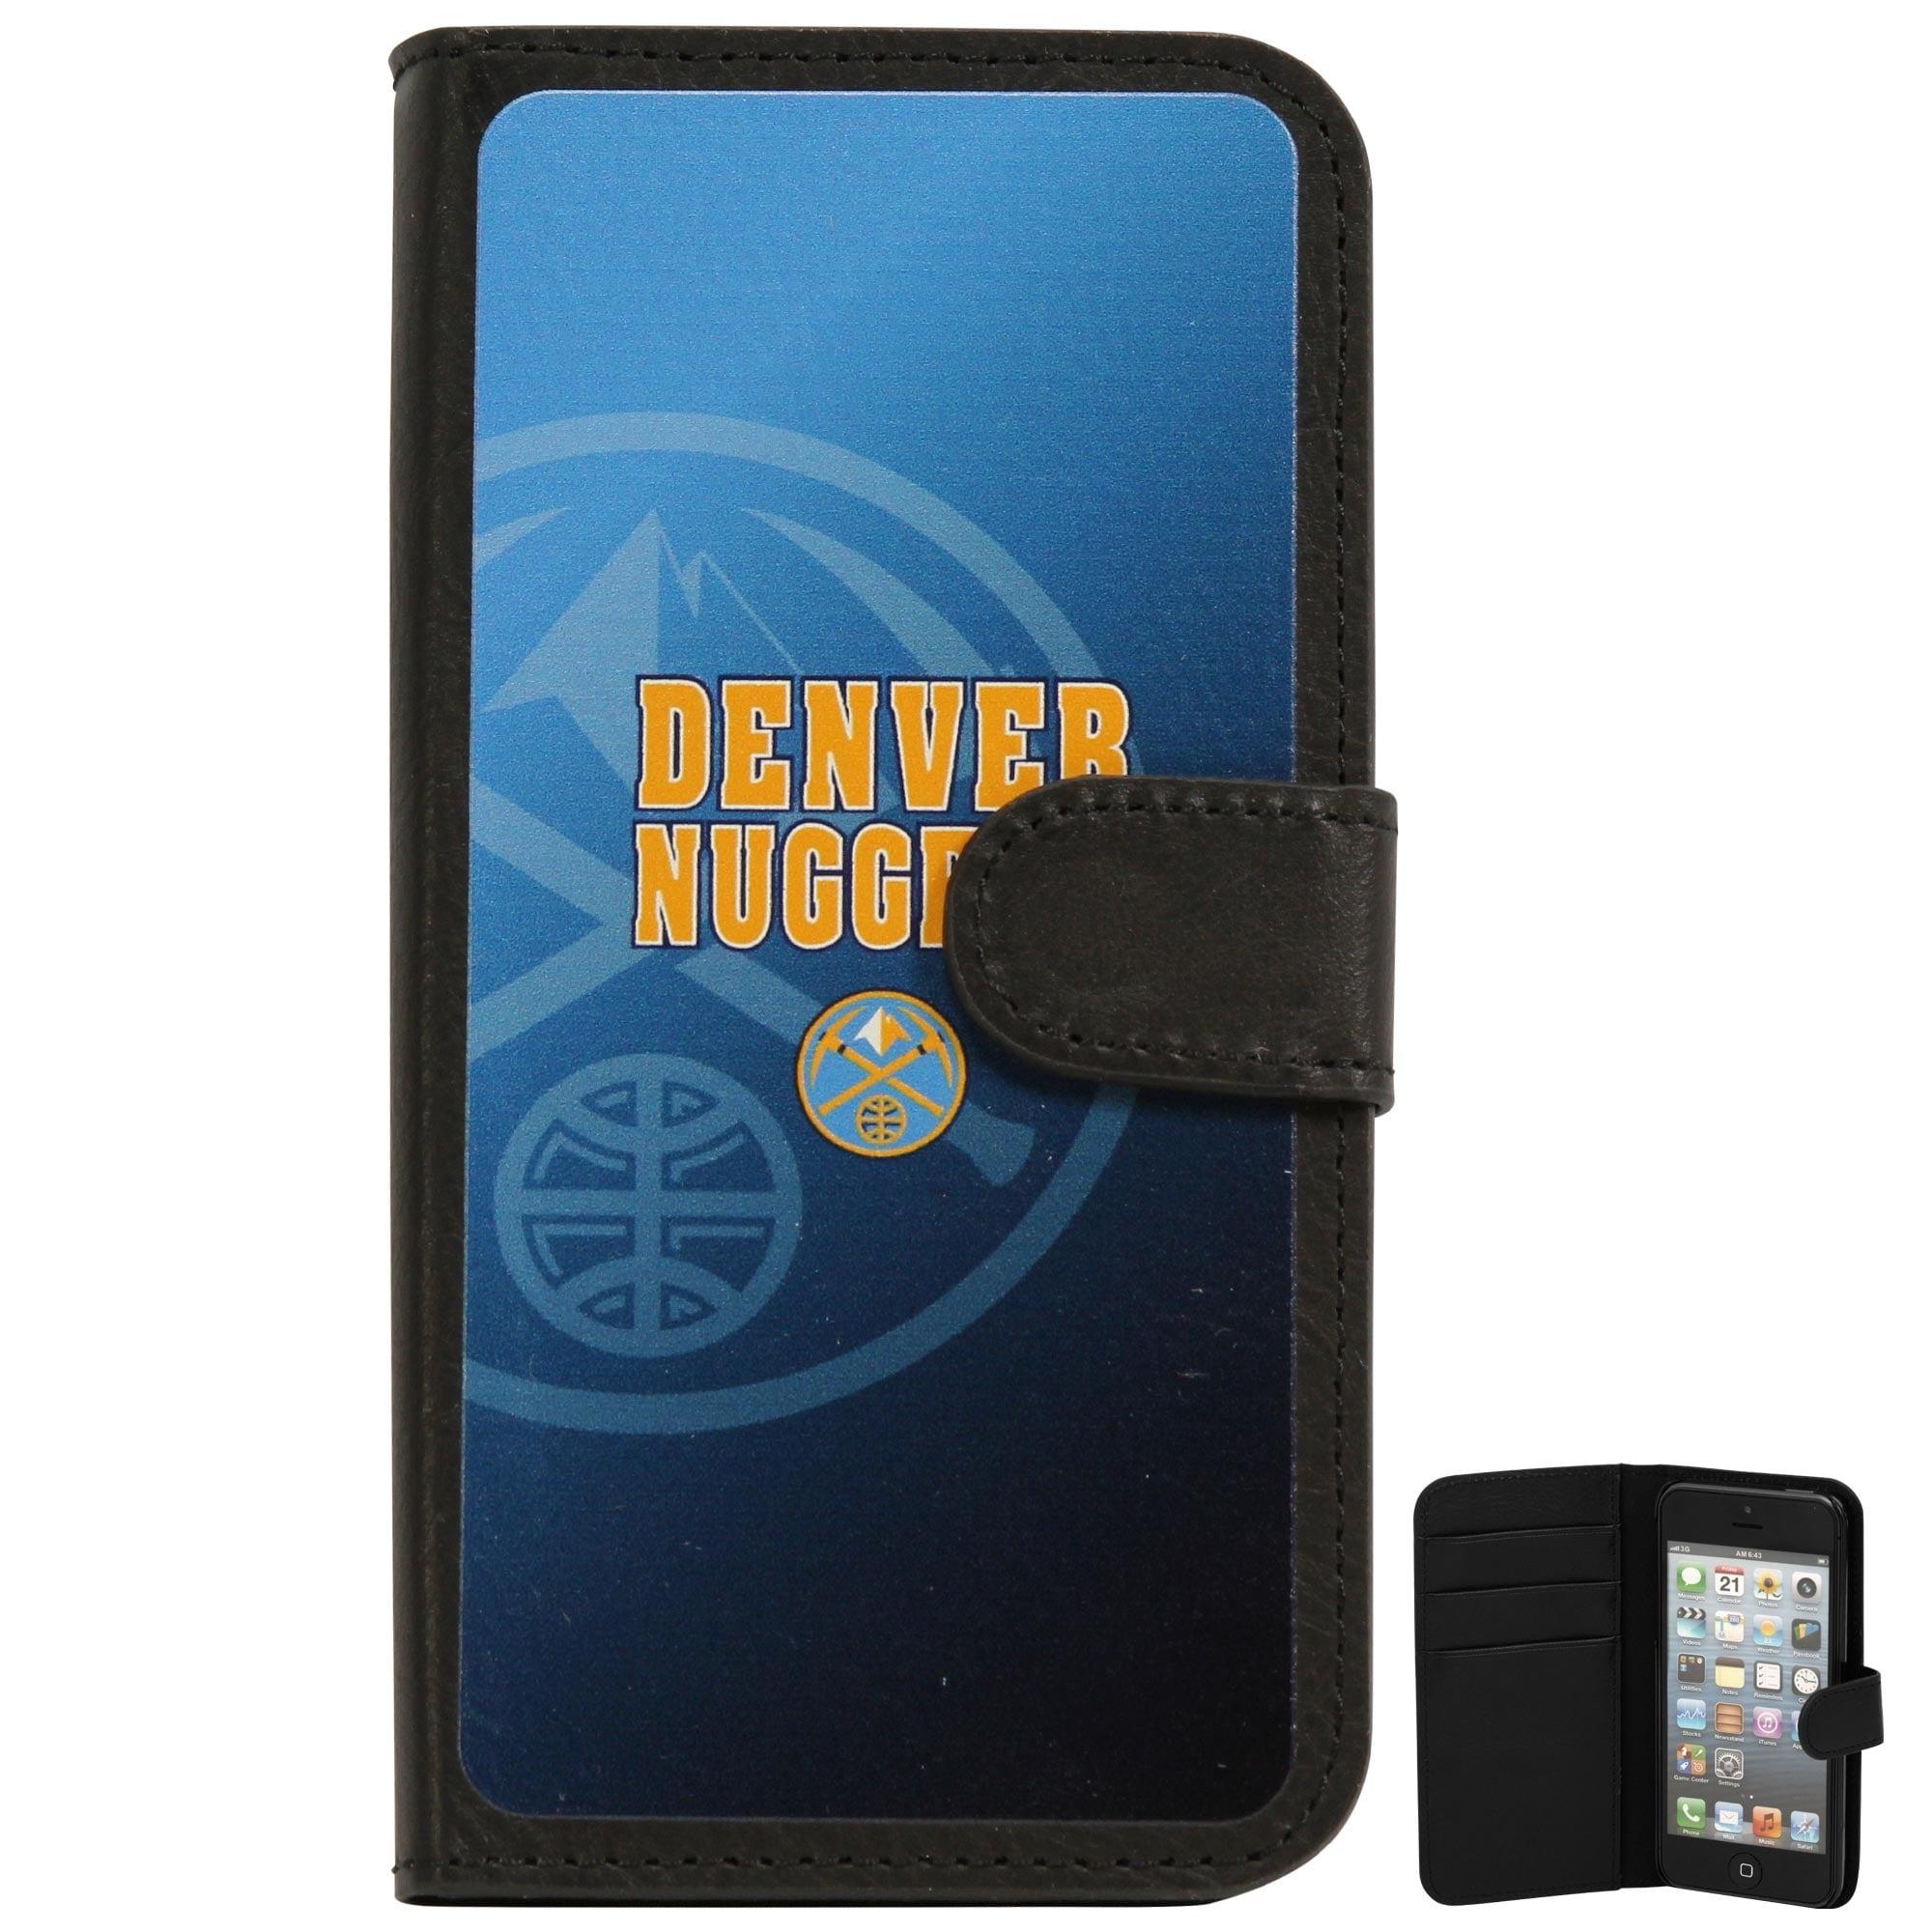 Denver Nuggets Watermark iPhone 5 Wallet - Black/Royal Blue